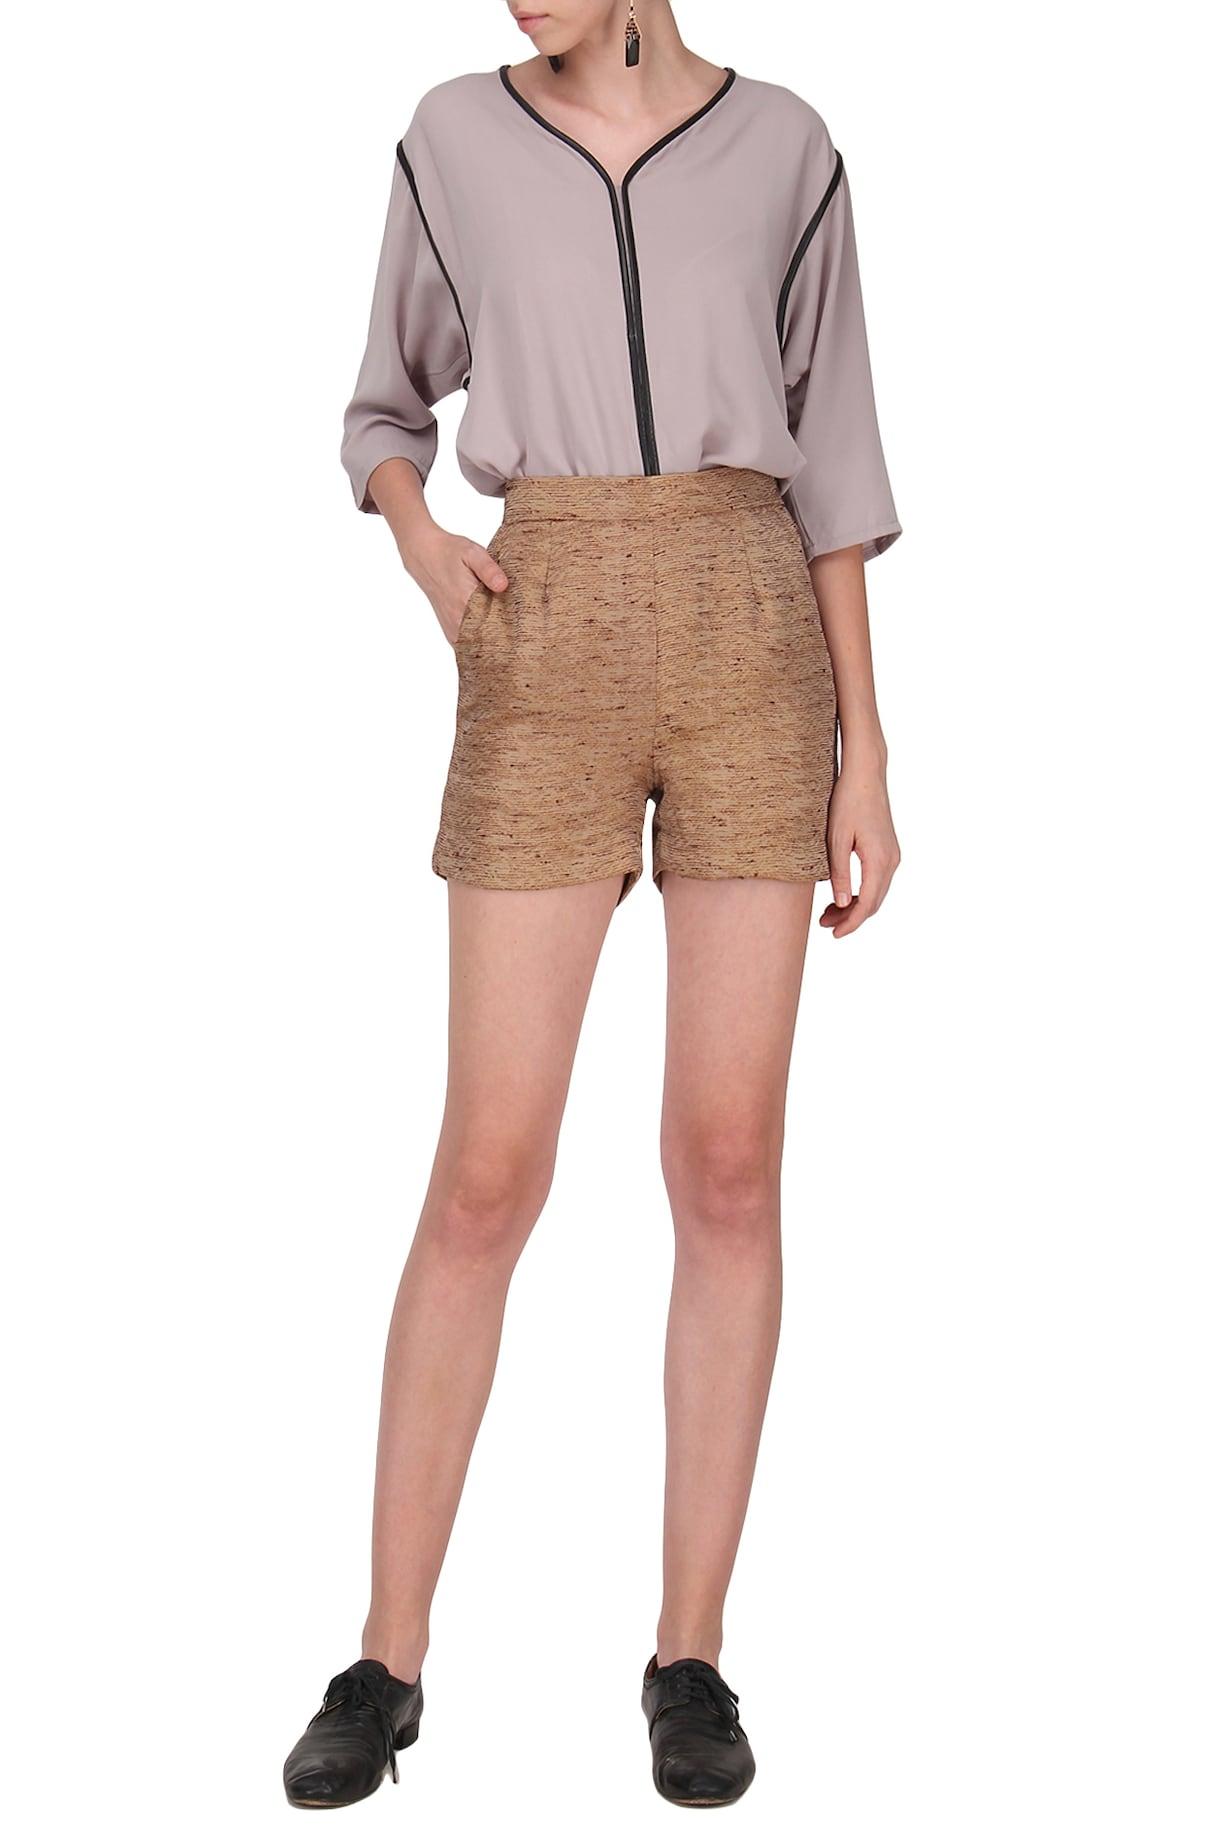 Priyanka Gangwal Shorts